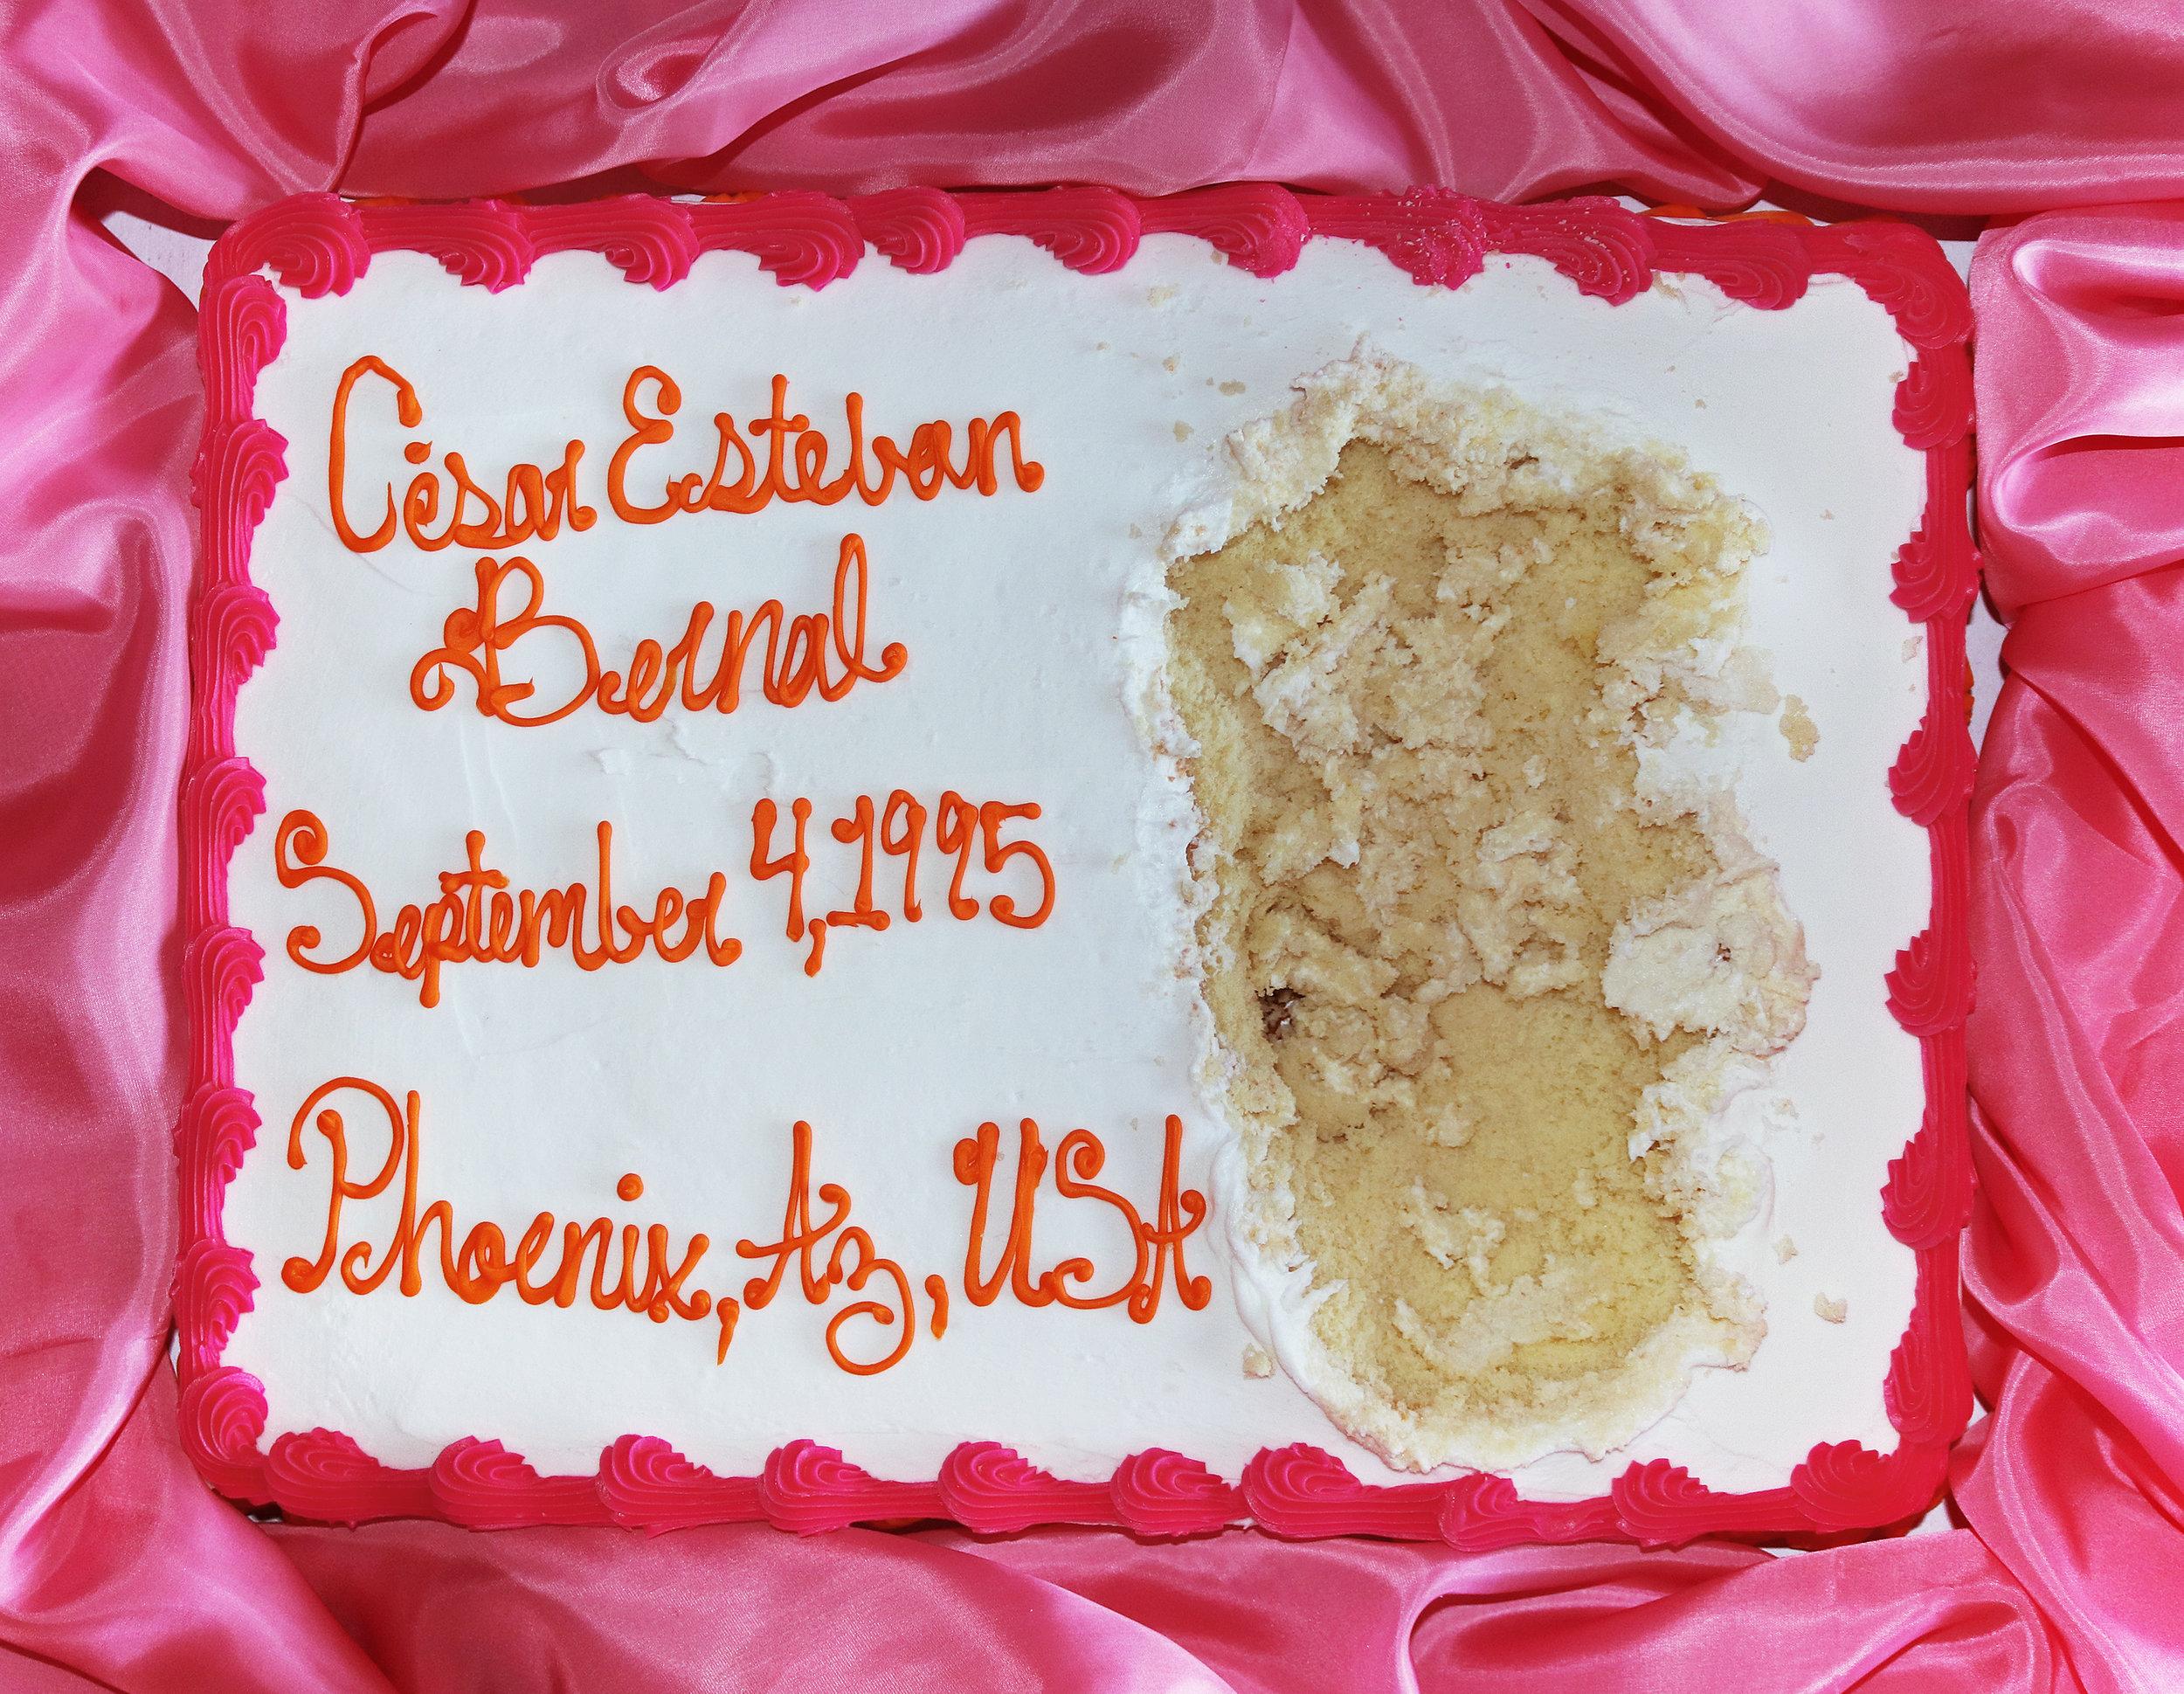 Identificación   buttercream frosting on cake